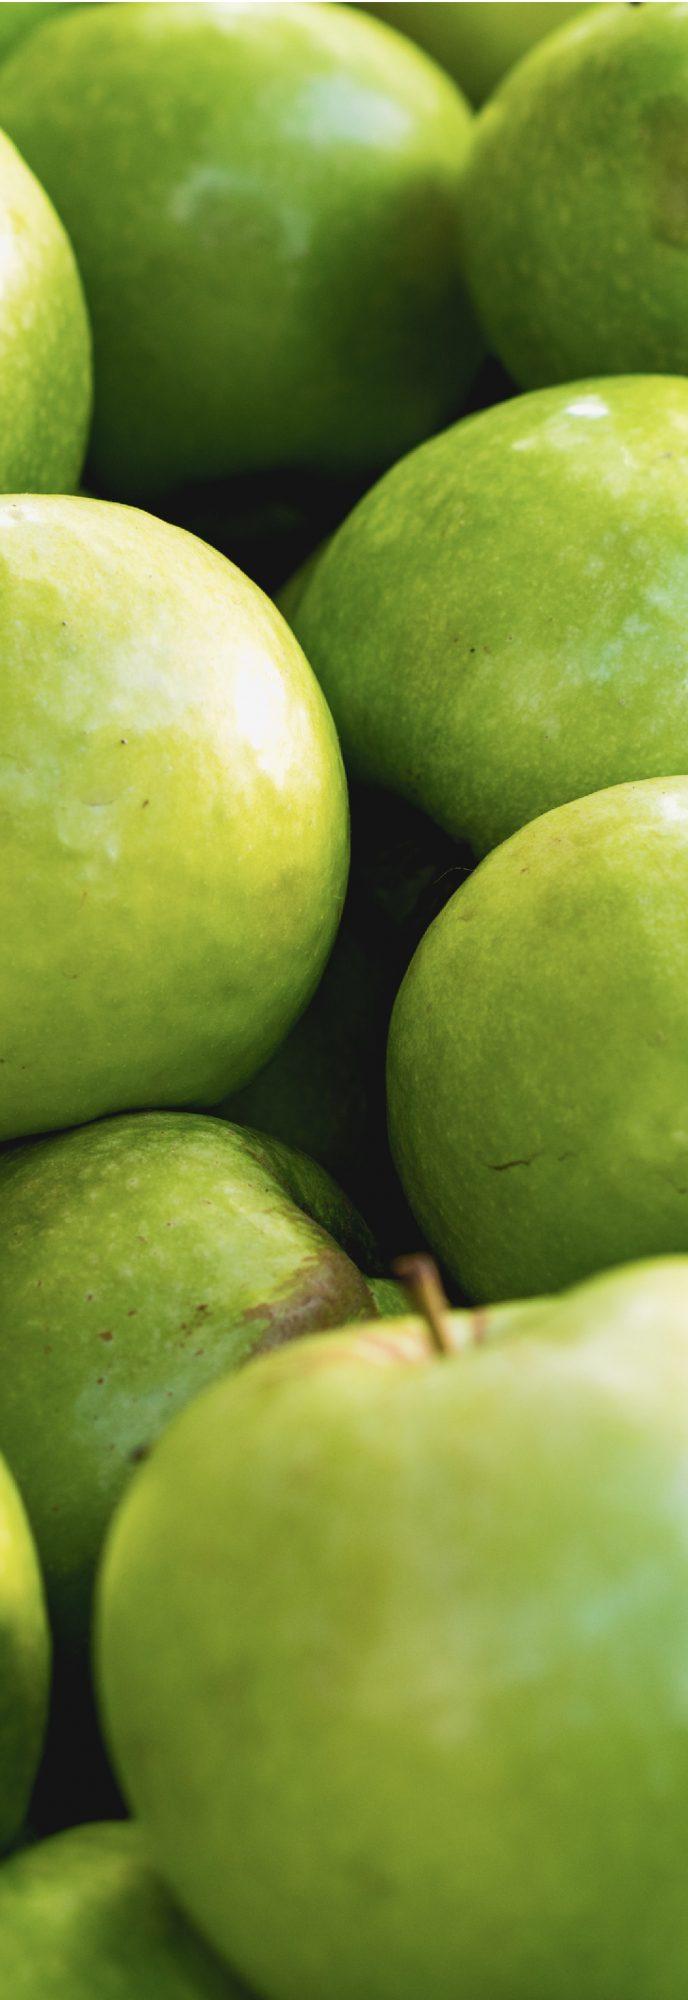 Kiva Website Lost Farm Sour Apple Template Texture